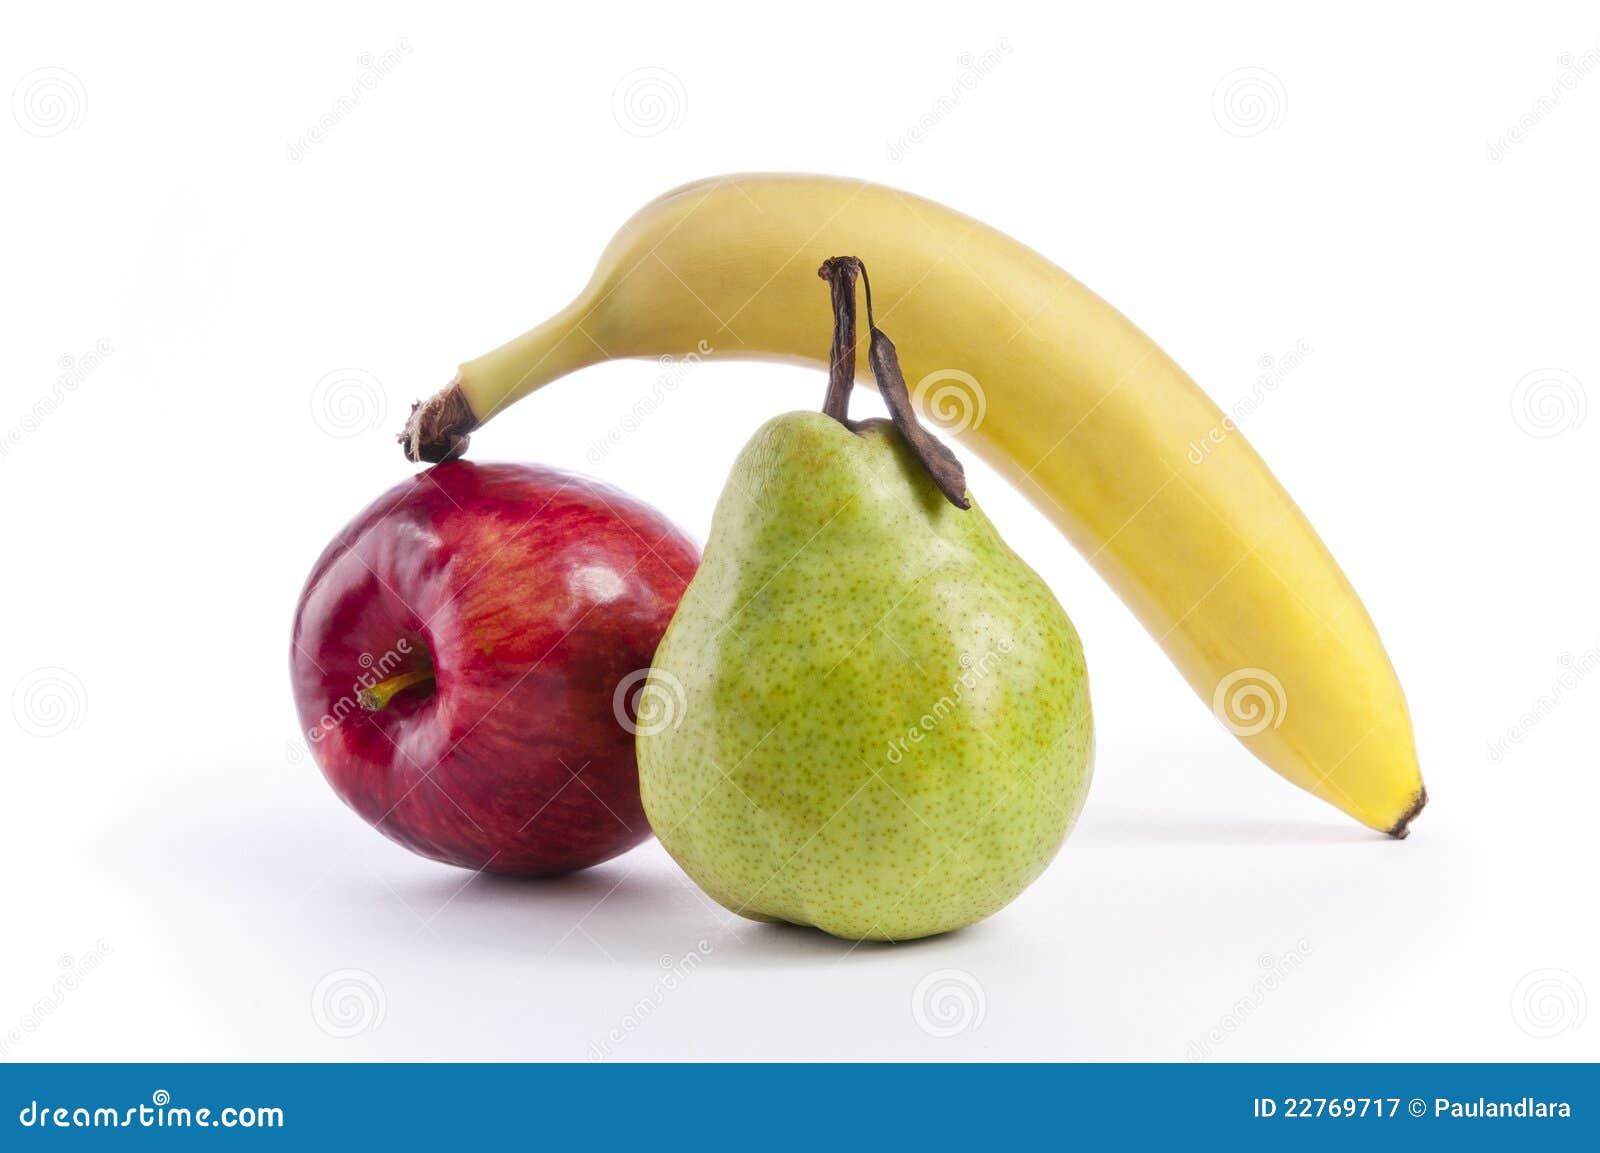 Apple, Pear and Banana